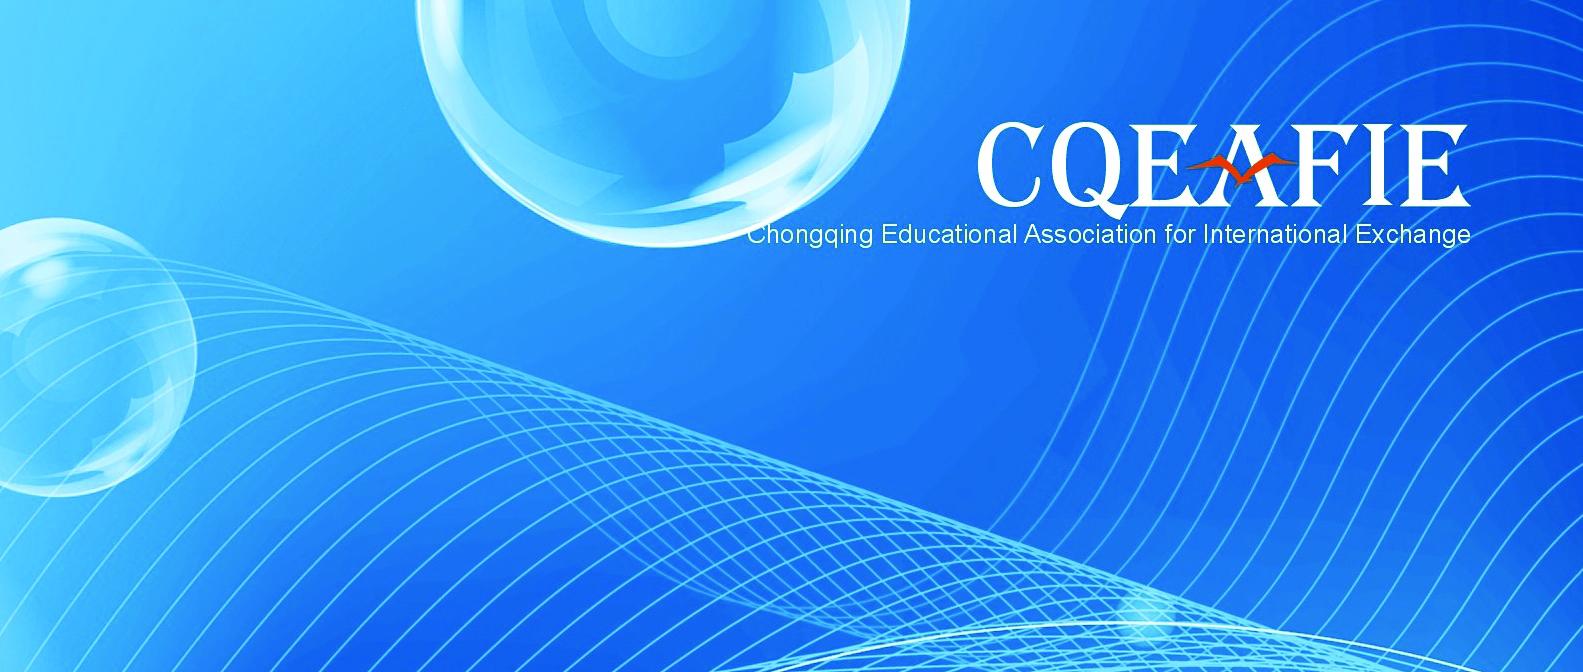 Logo Agents Chongqing Education International Exchange Association.jpg